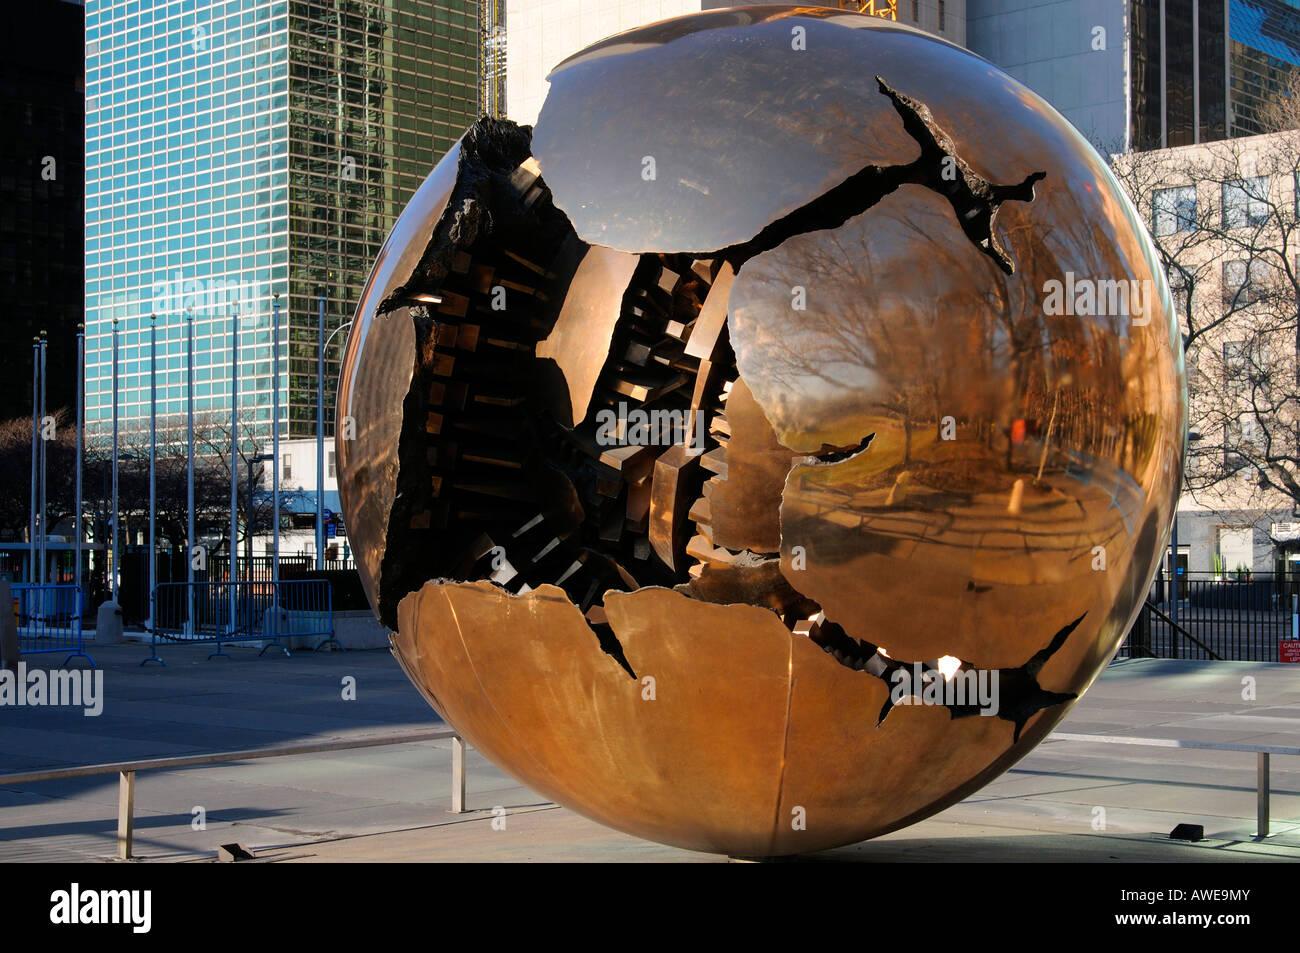 Bronze sculpture Sphere Within Sphere by Arnaldo Pomodoro, UN garden, New York, USA - Stock Image